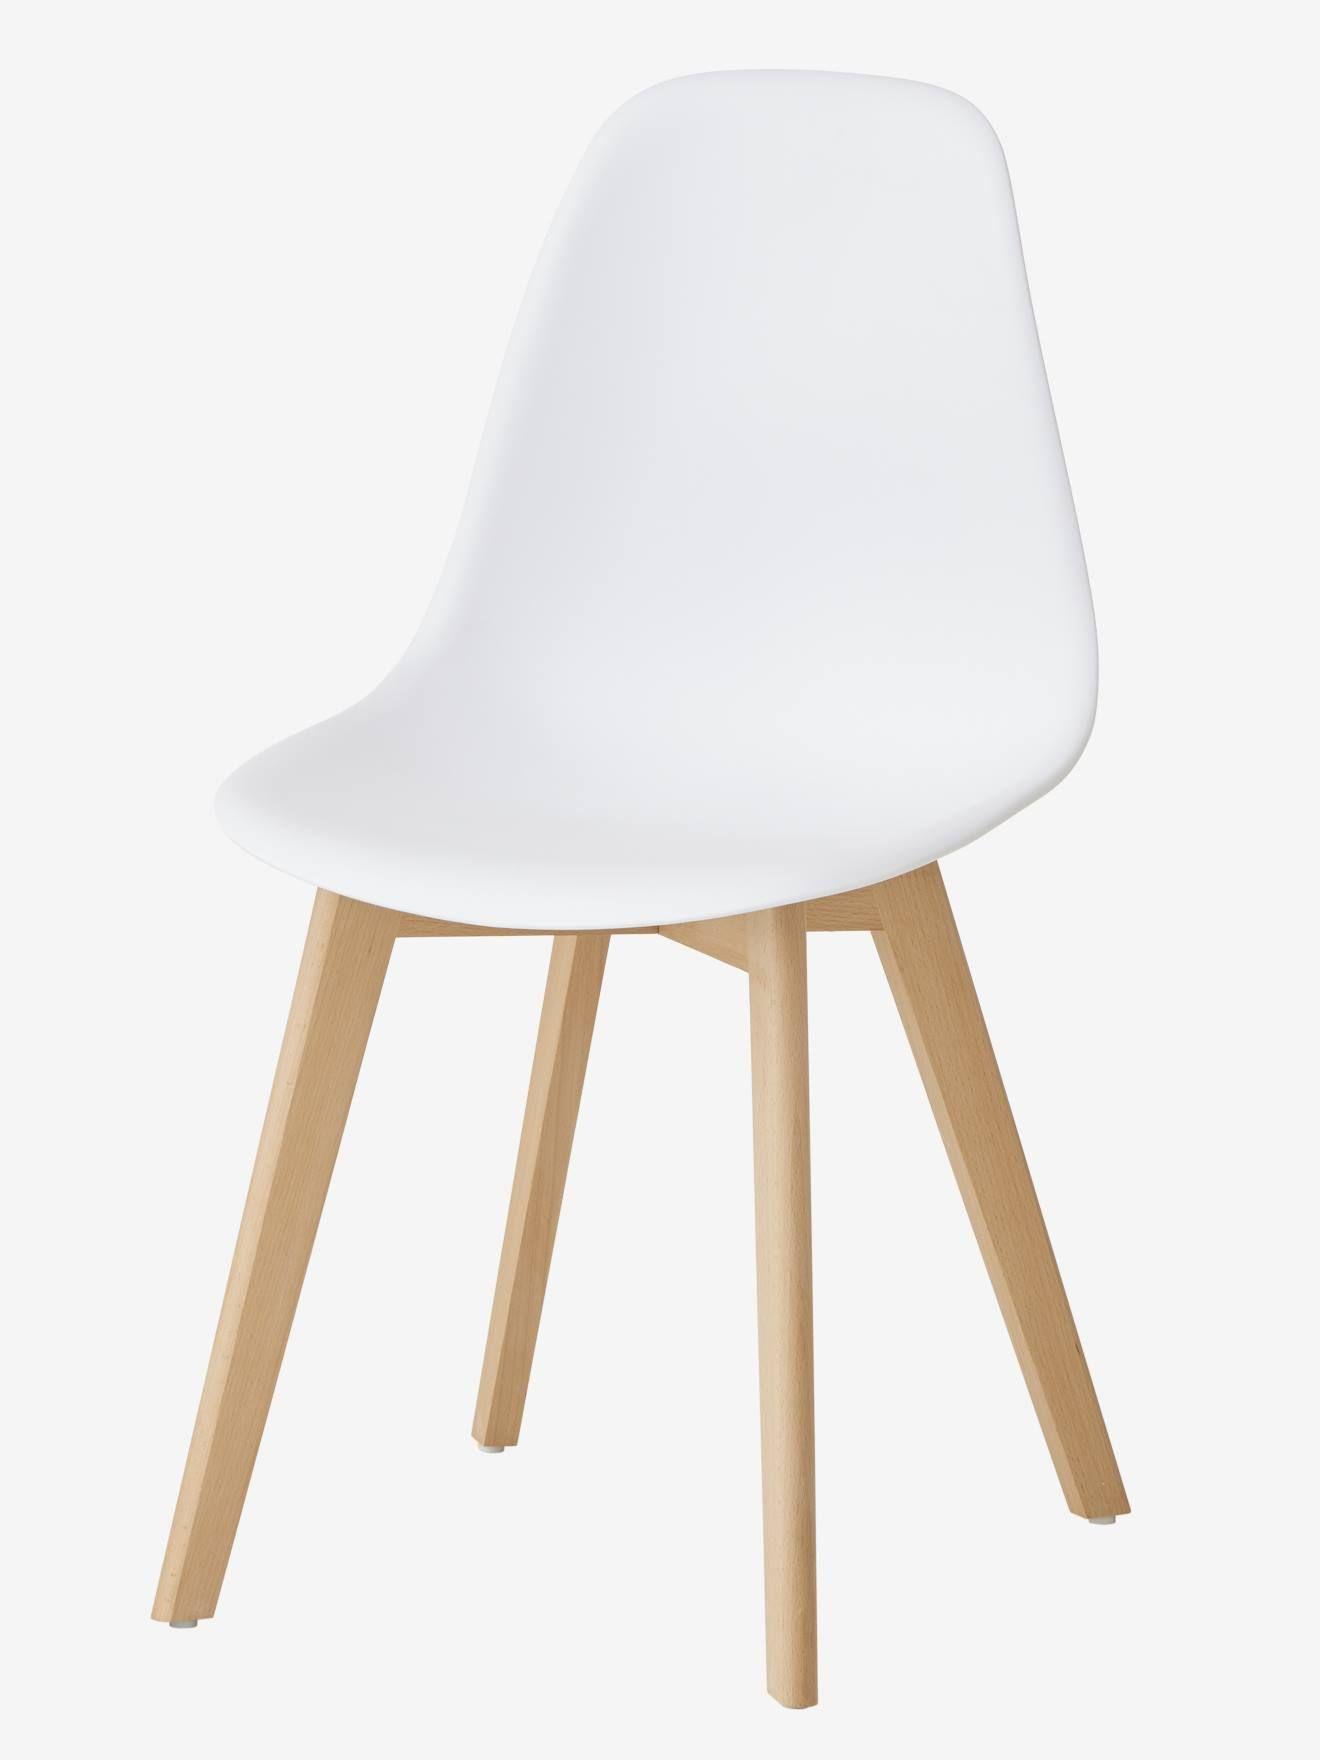 blanc Vertbaudet primaire Scandinave Chaise Chaise wym80vnON